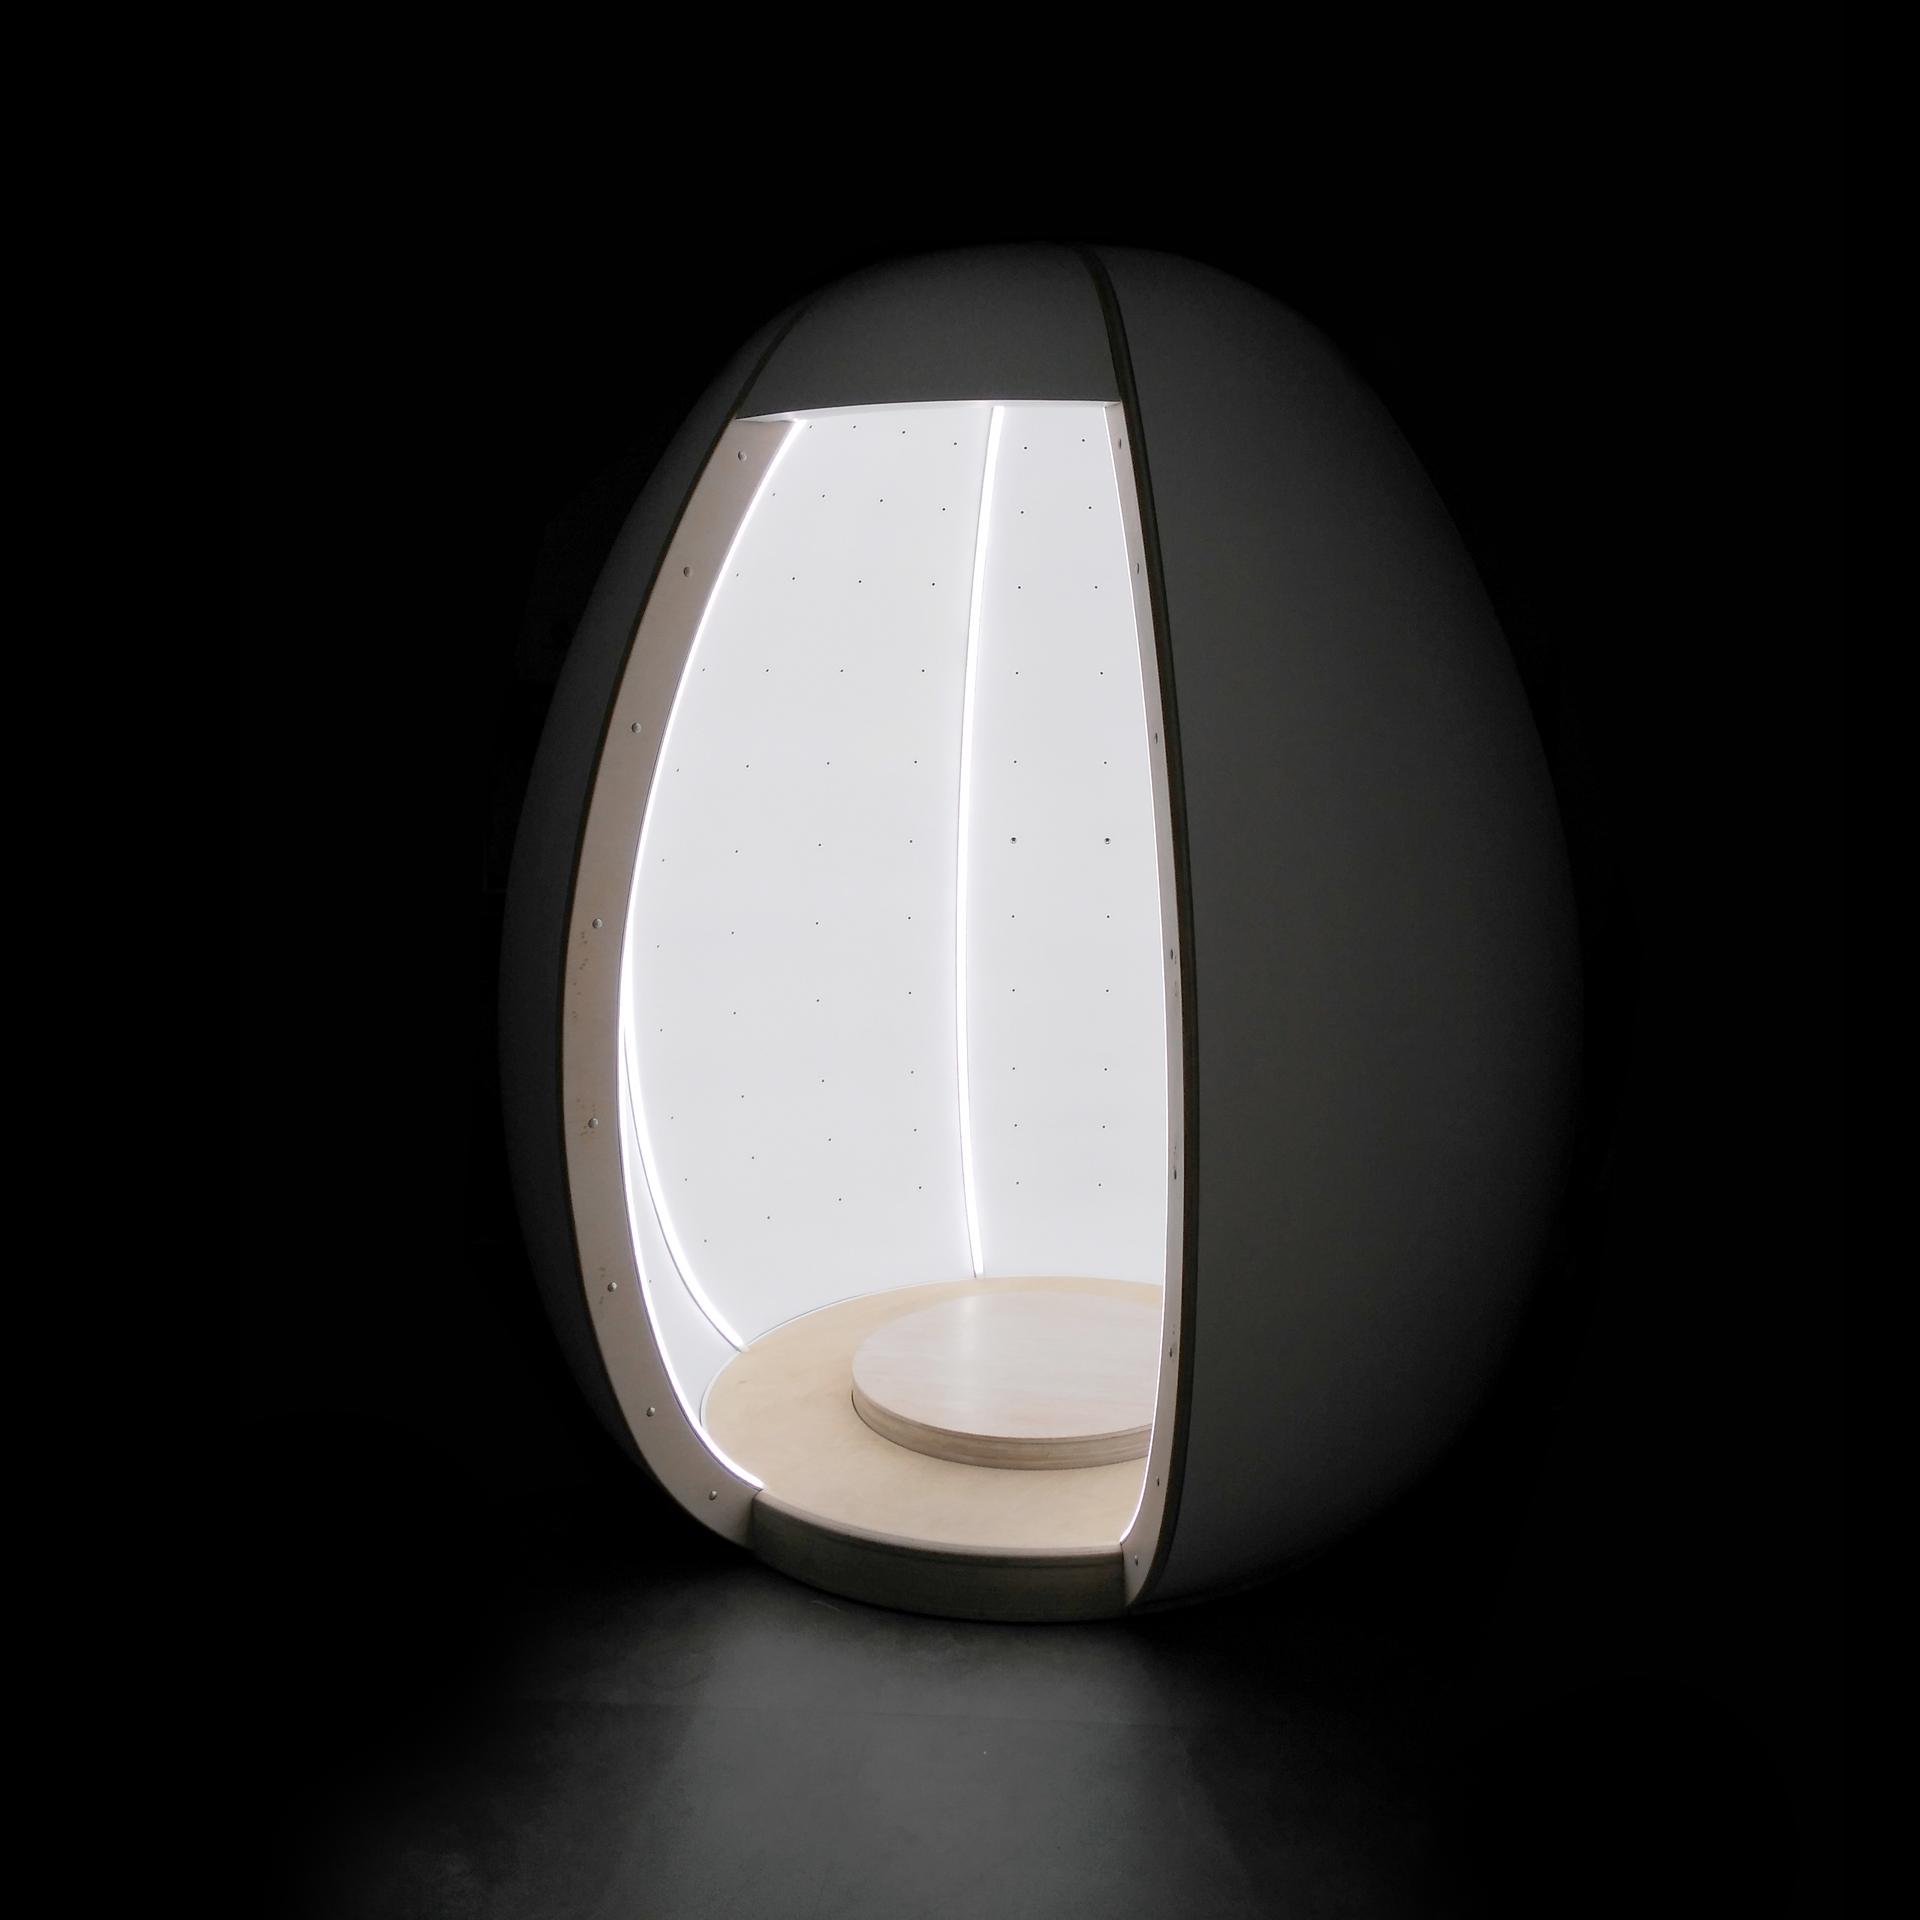 cabine avatar 3d